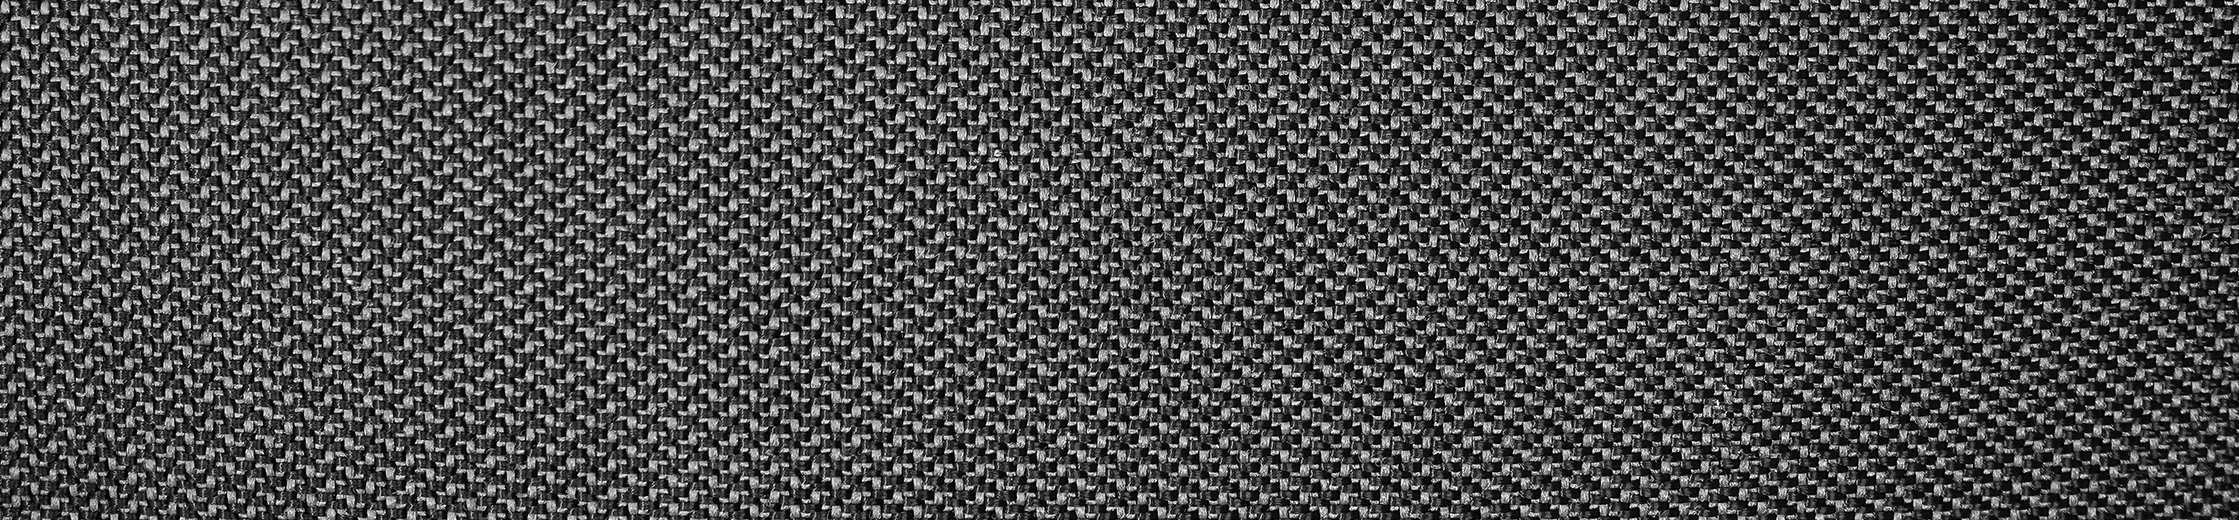 Polypropylen & Nylon Mischung